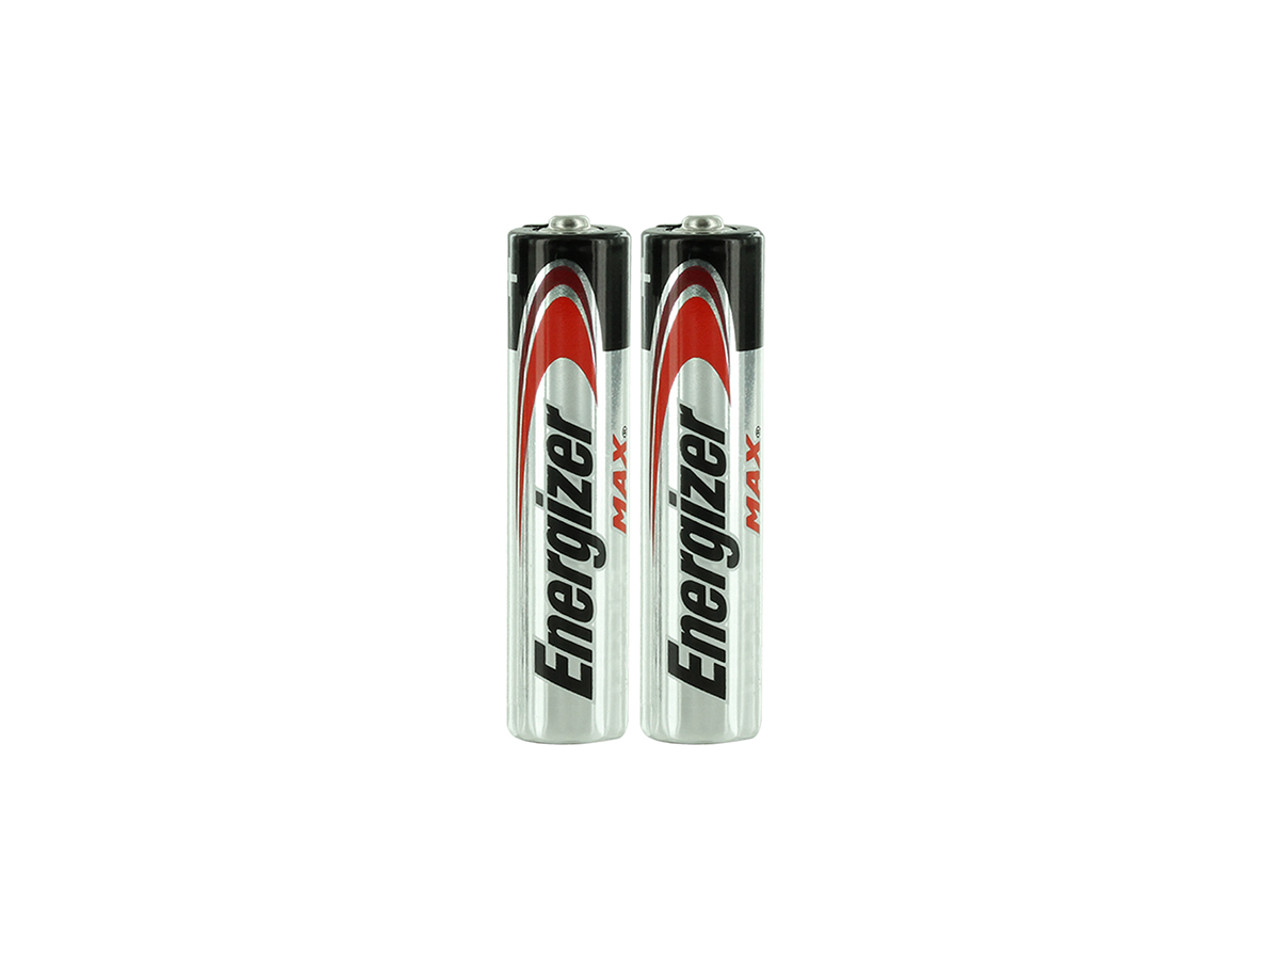 AAA Batteries - 2 Pack